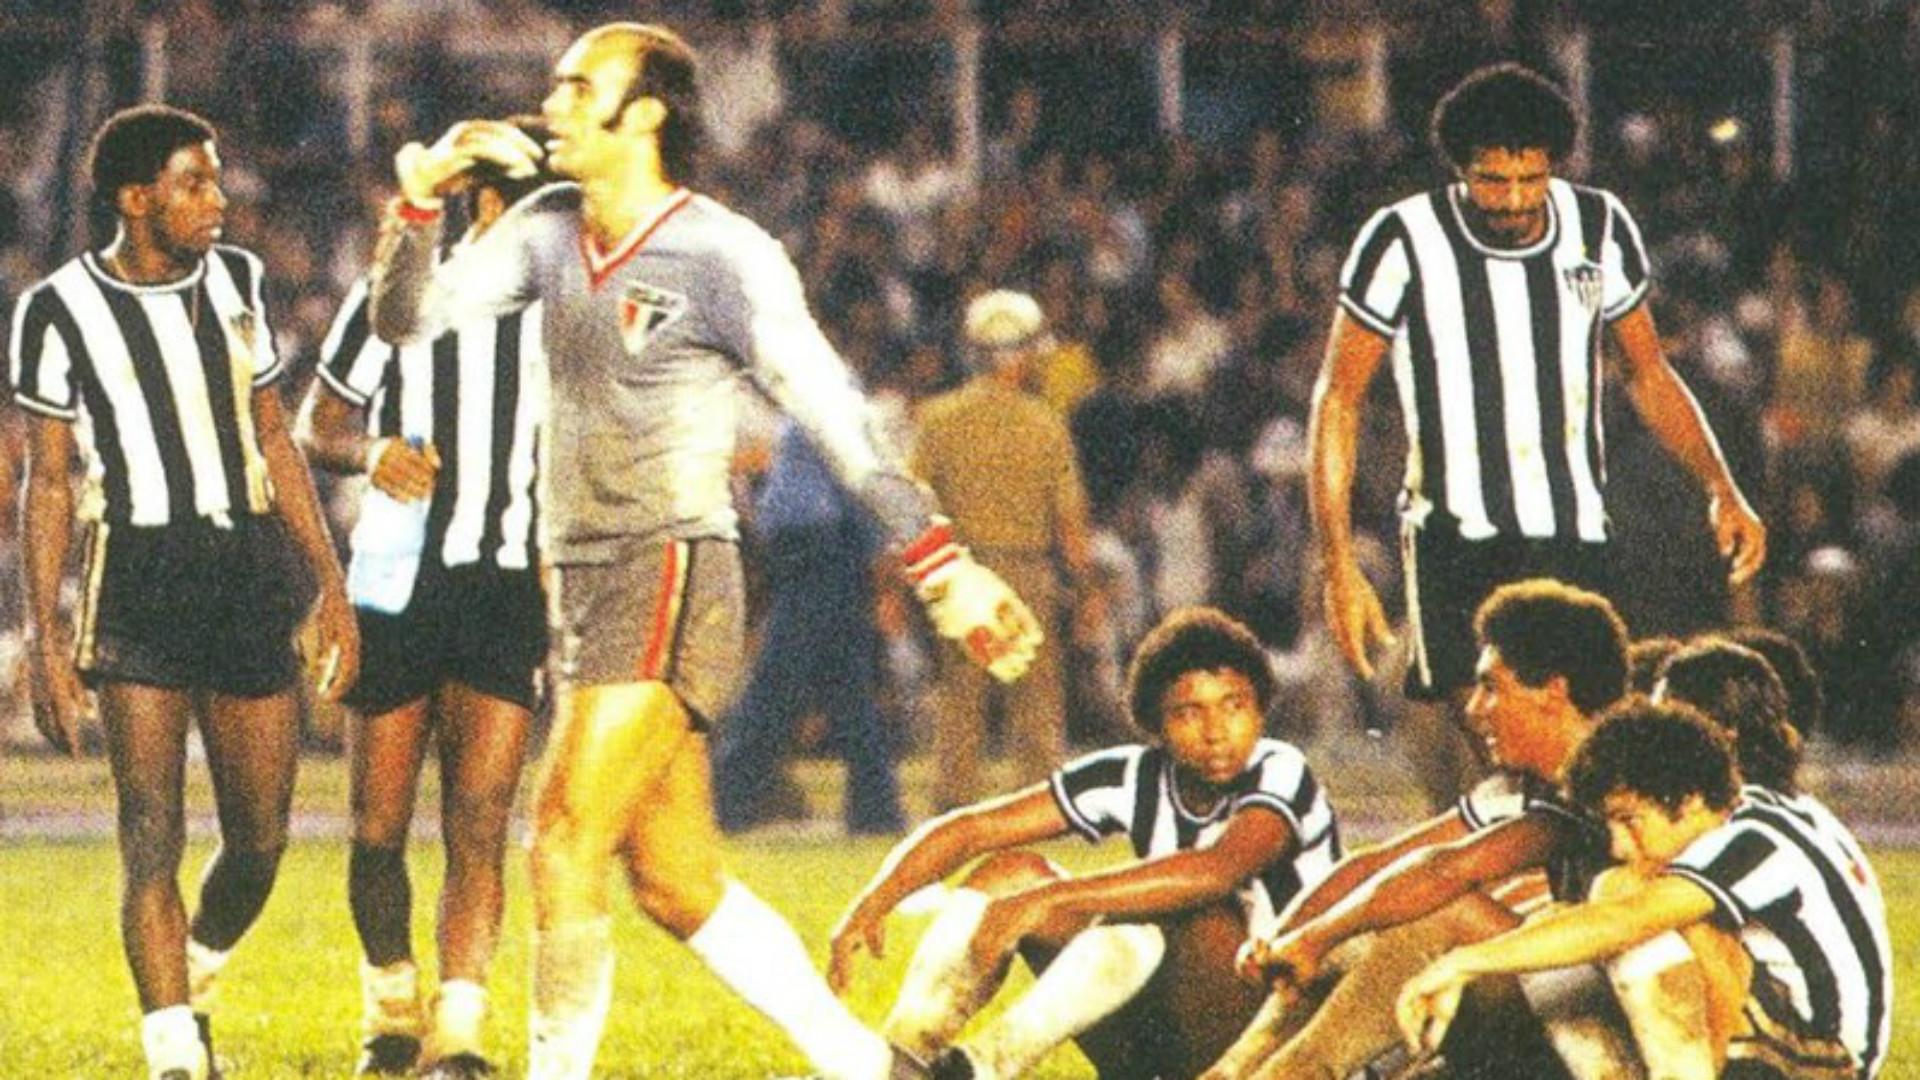 Waldir Peres (1973-1984) - São Paulo